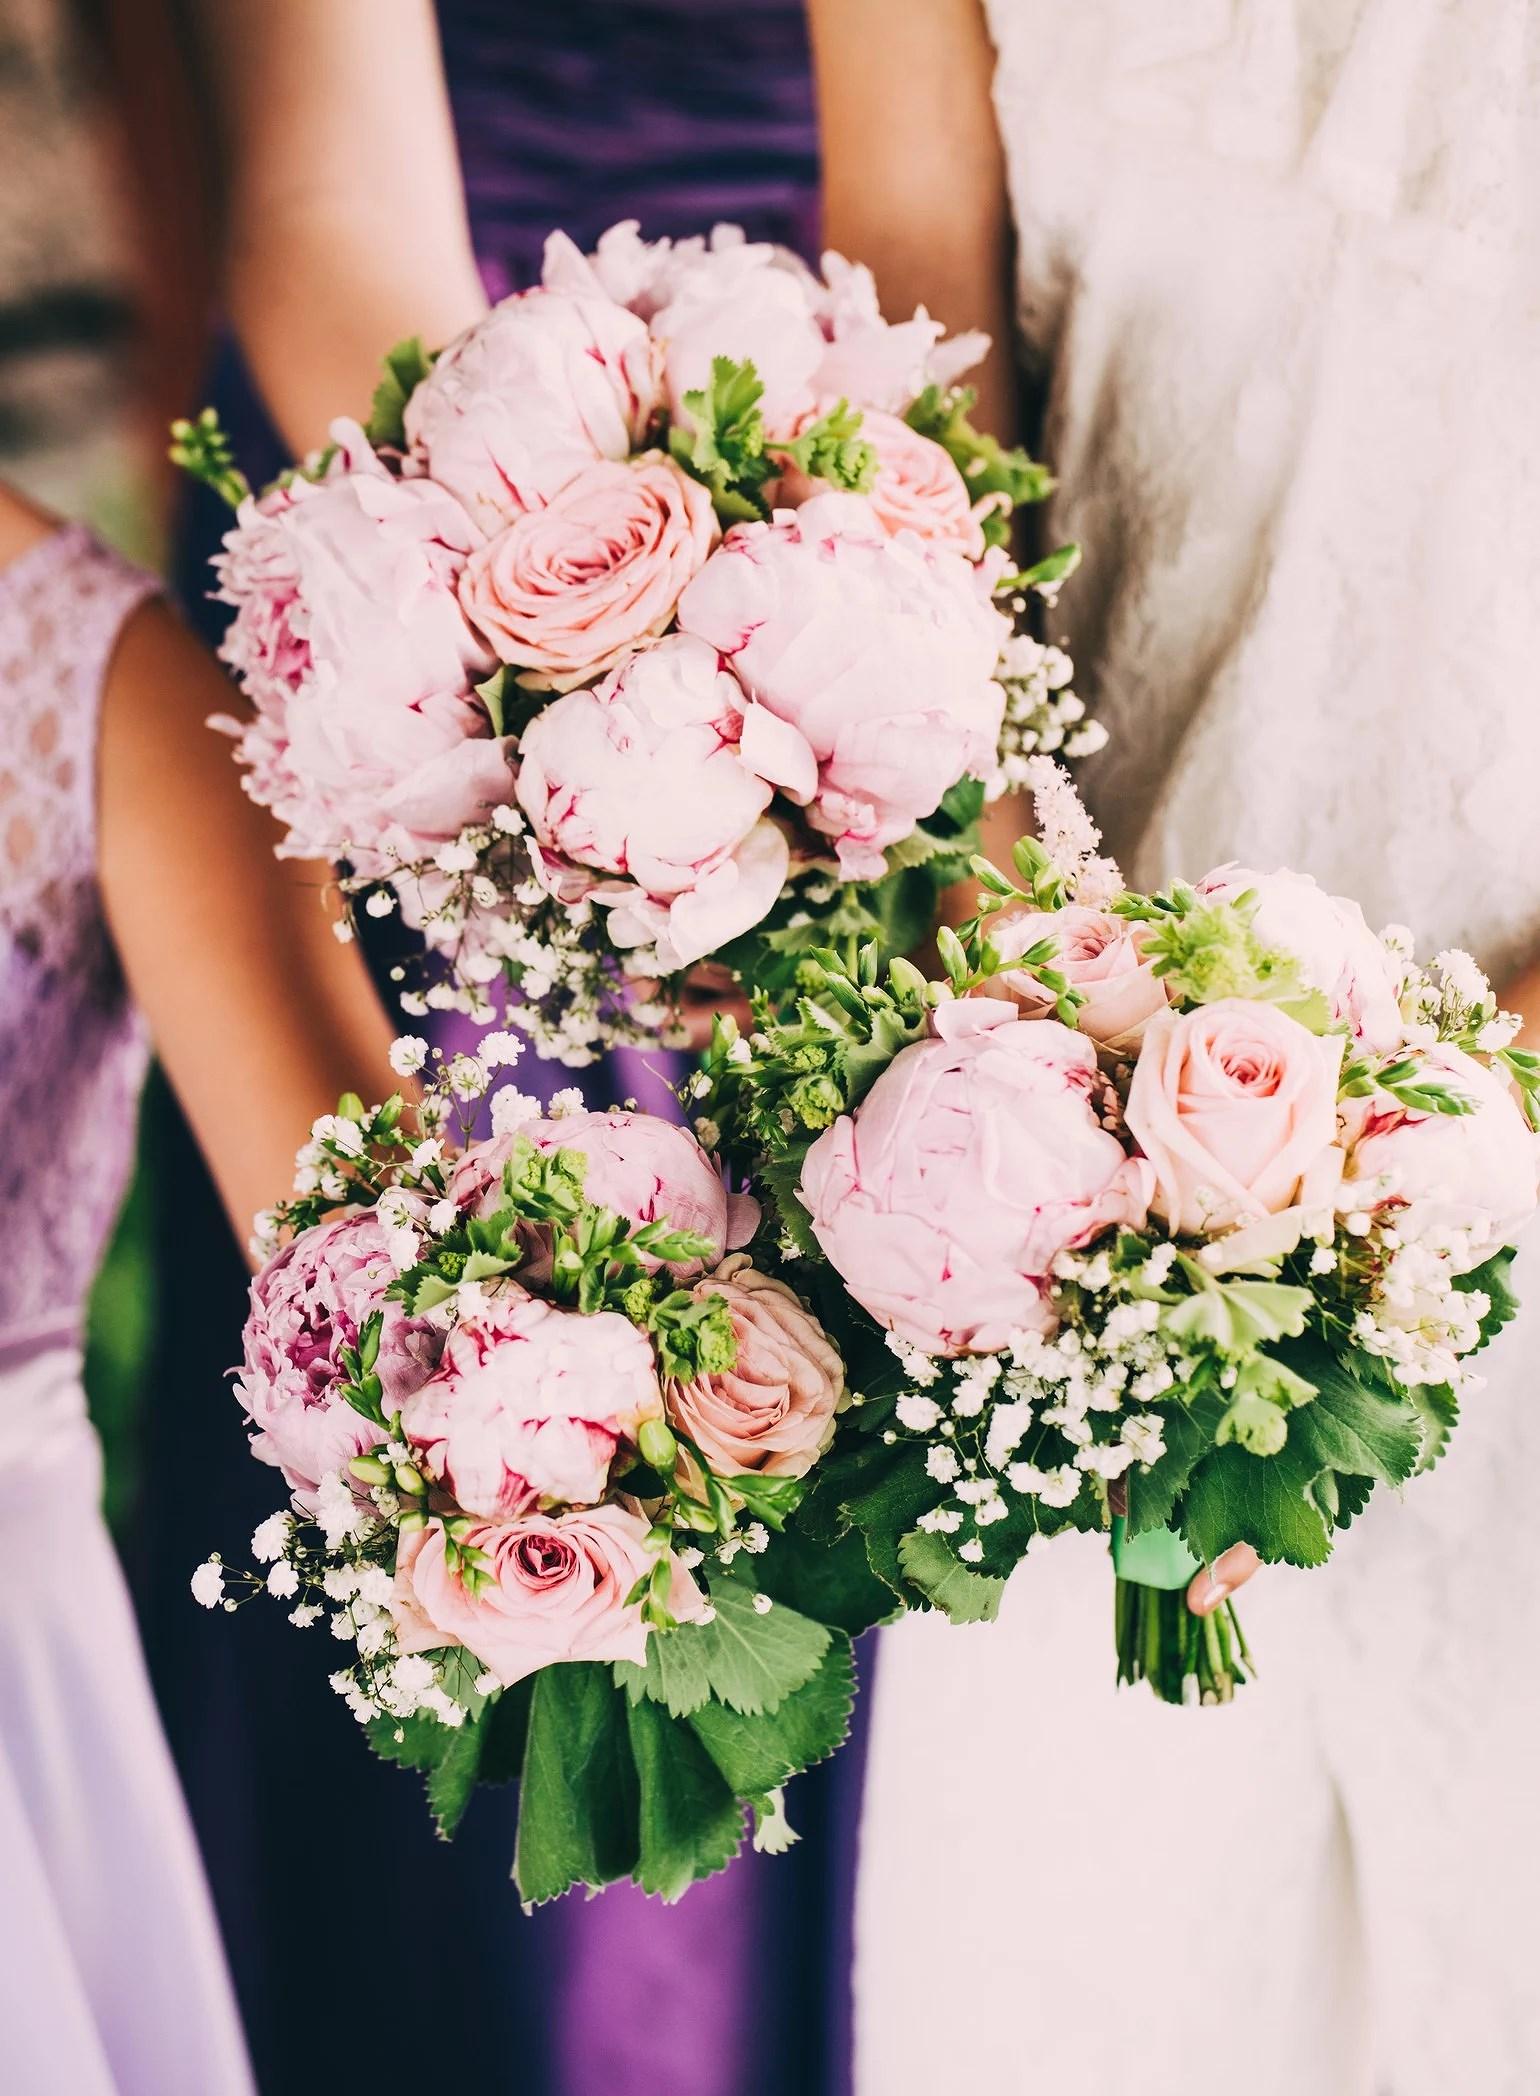 Cecilia & Björns Bröllop